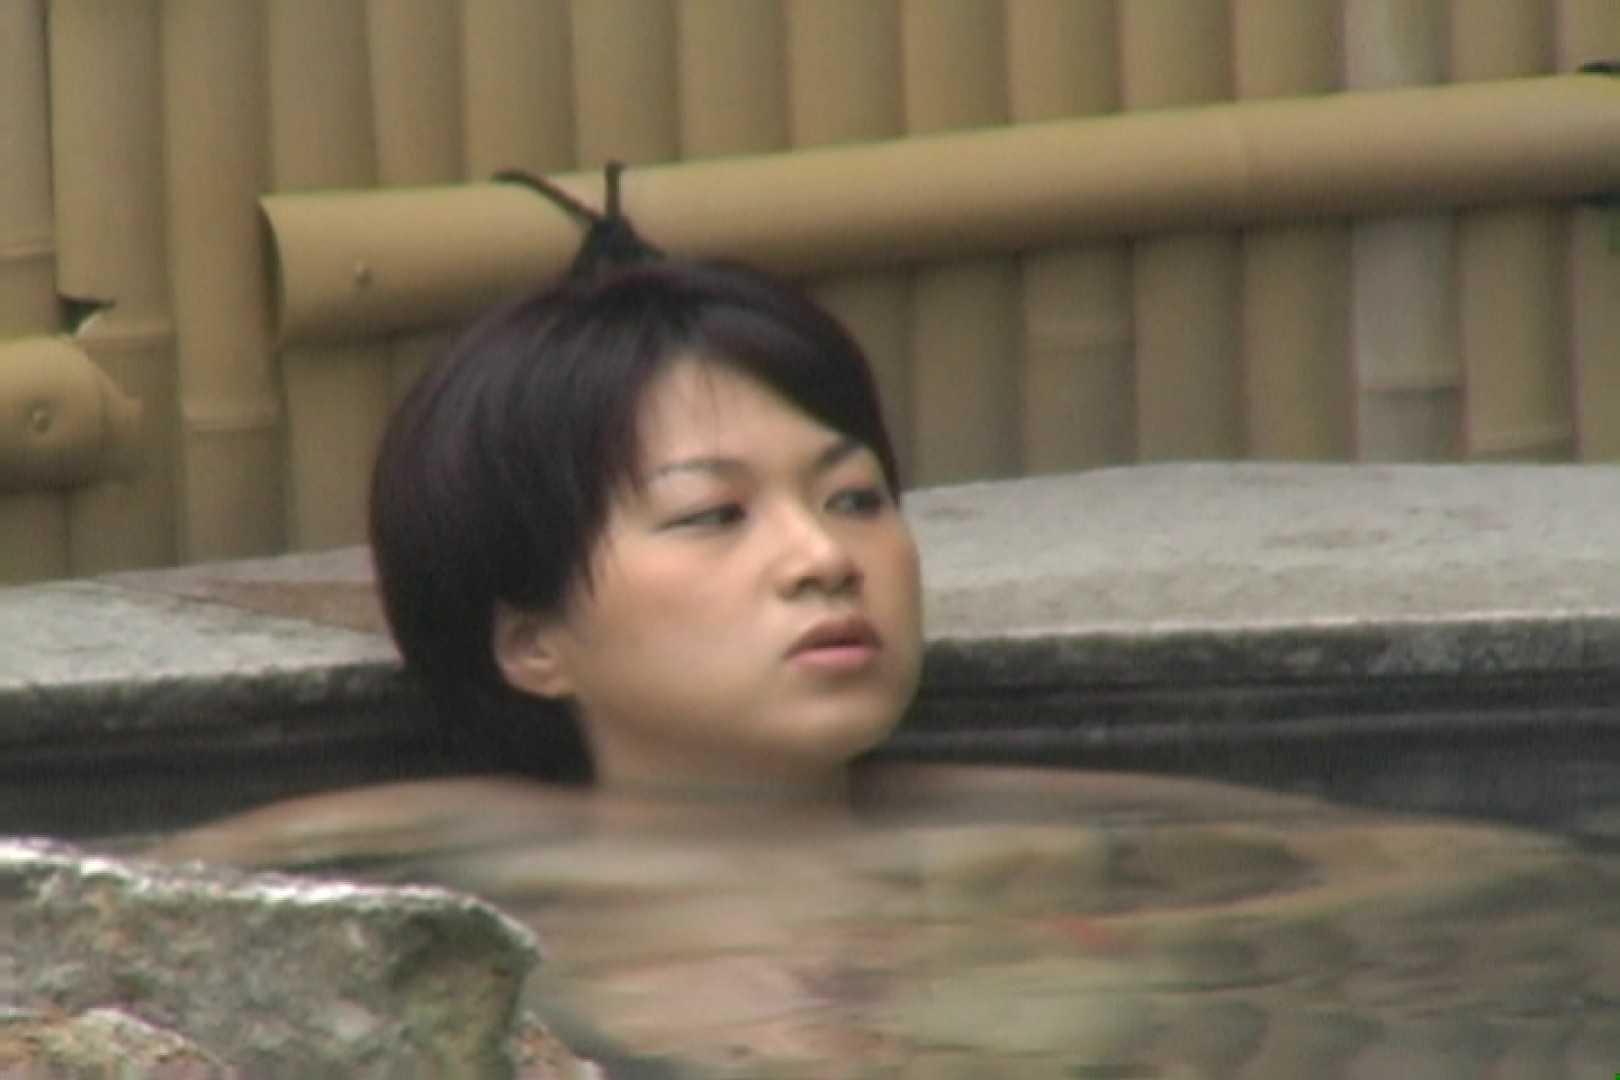 Aquaな露天風呂Vol.624 露天風呂編  88PIX 38